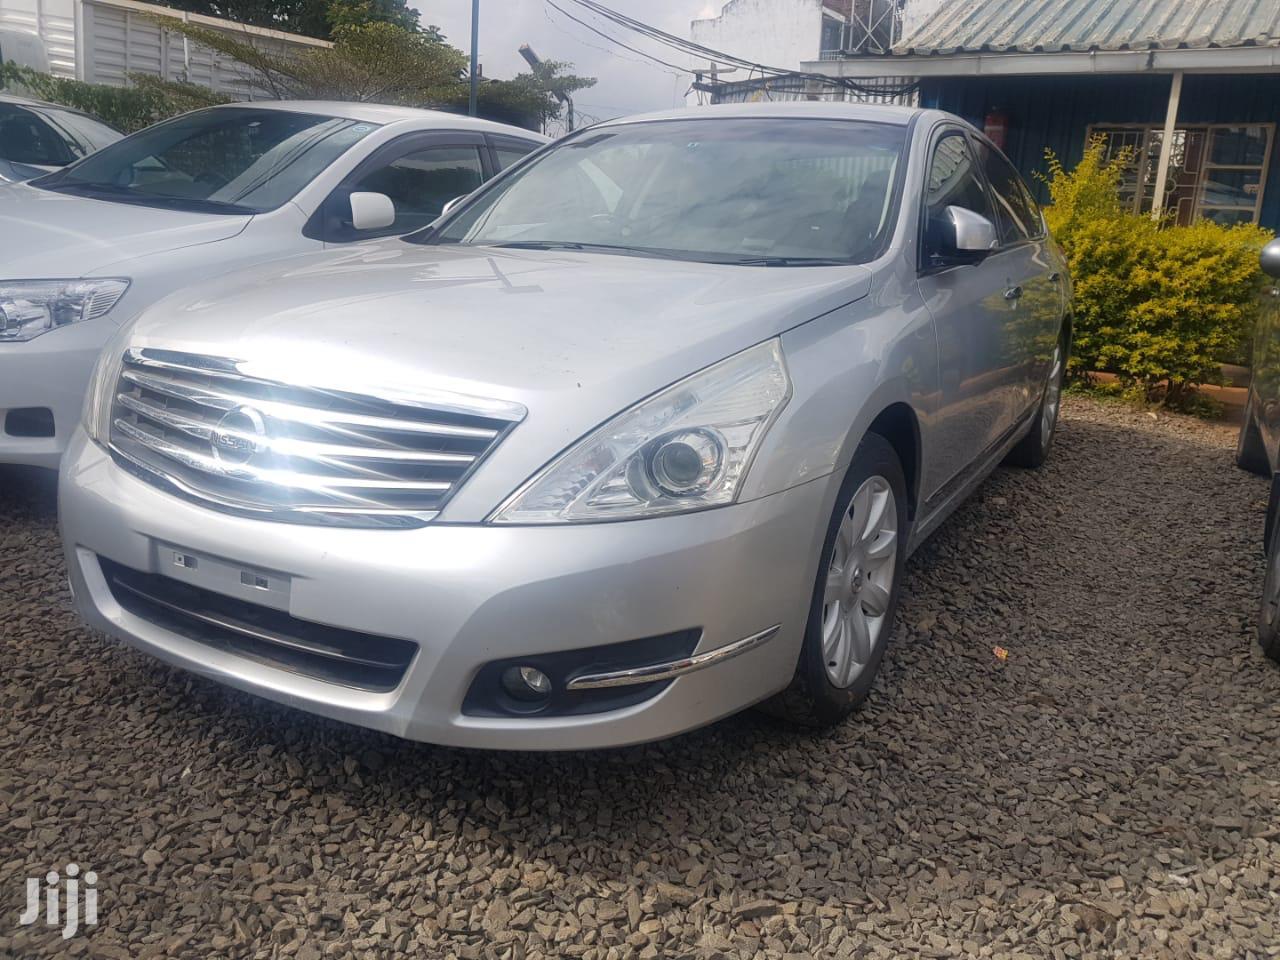 Archive: Nissan Teana 2011 Silver